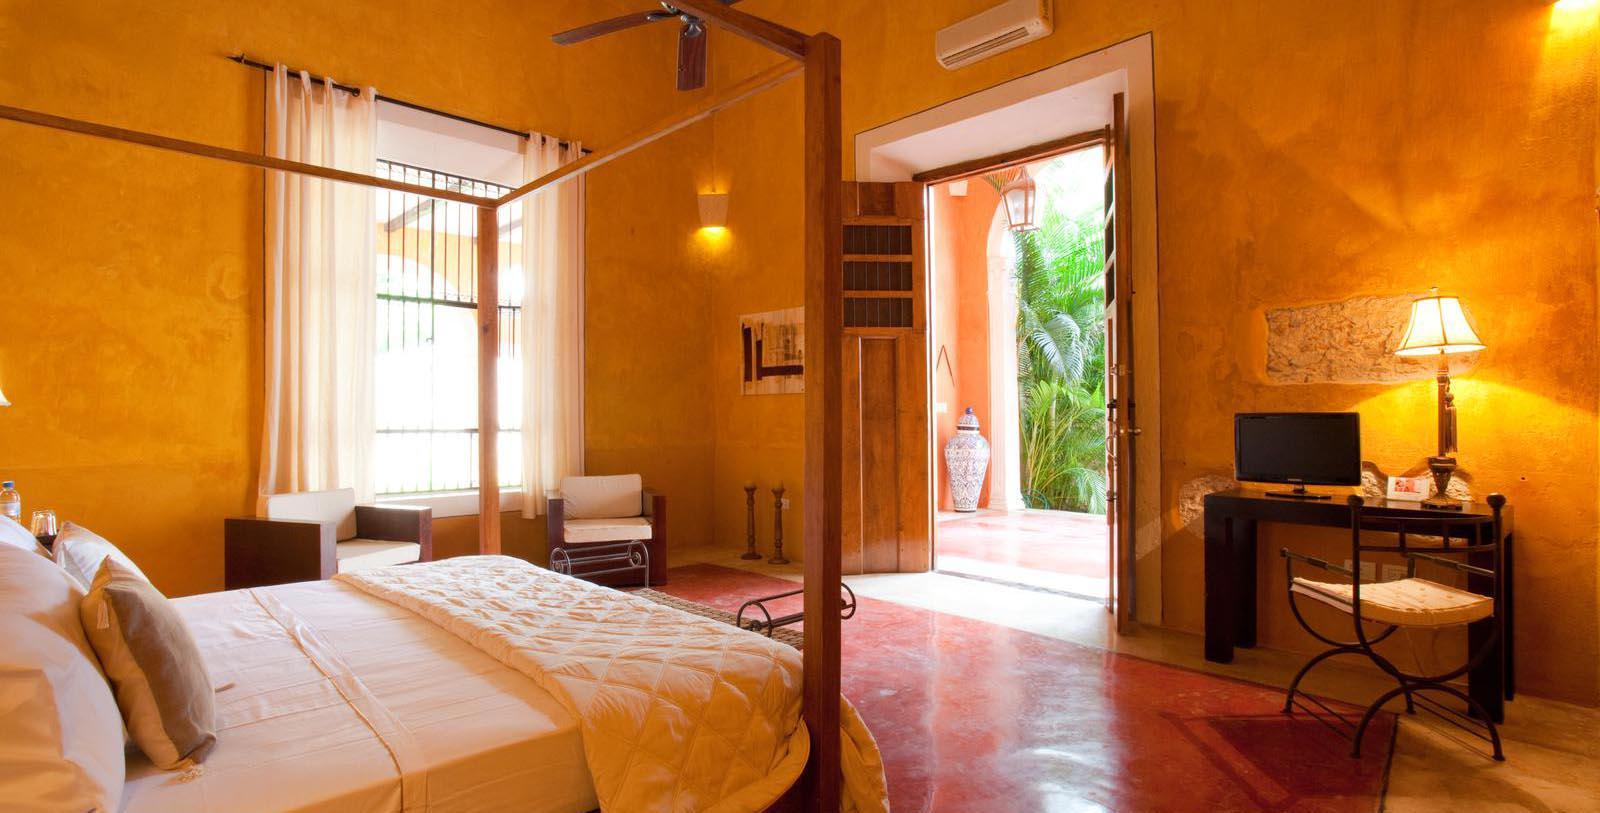 Image Guestroom Interiorof Hotel Hacienda Merida, Mexico, 1700s, Member of Historic Hotels Worldwide, Location Map